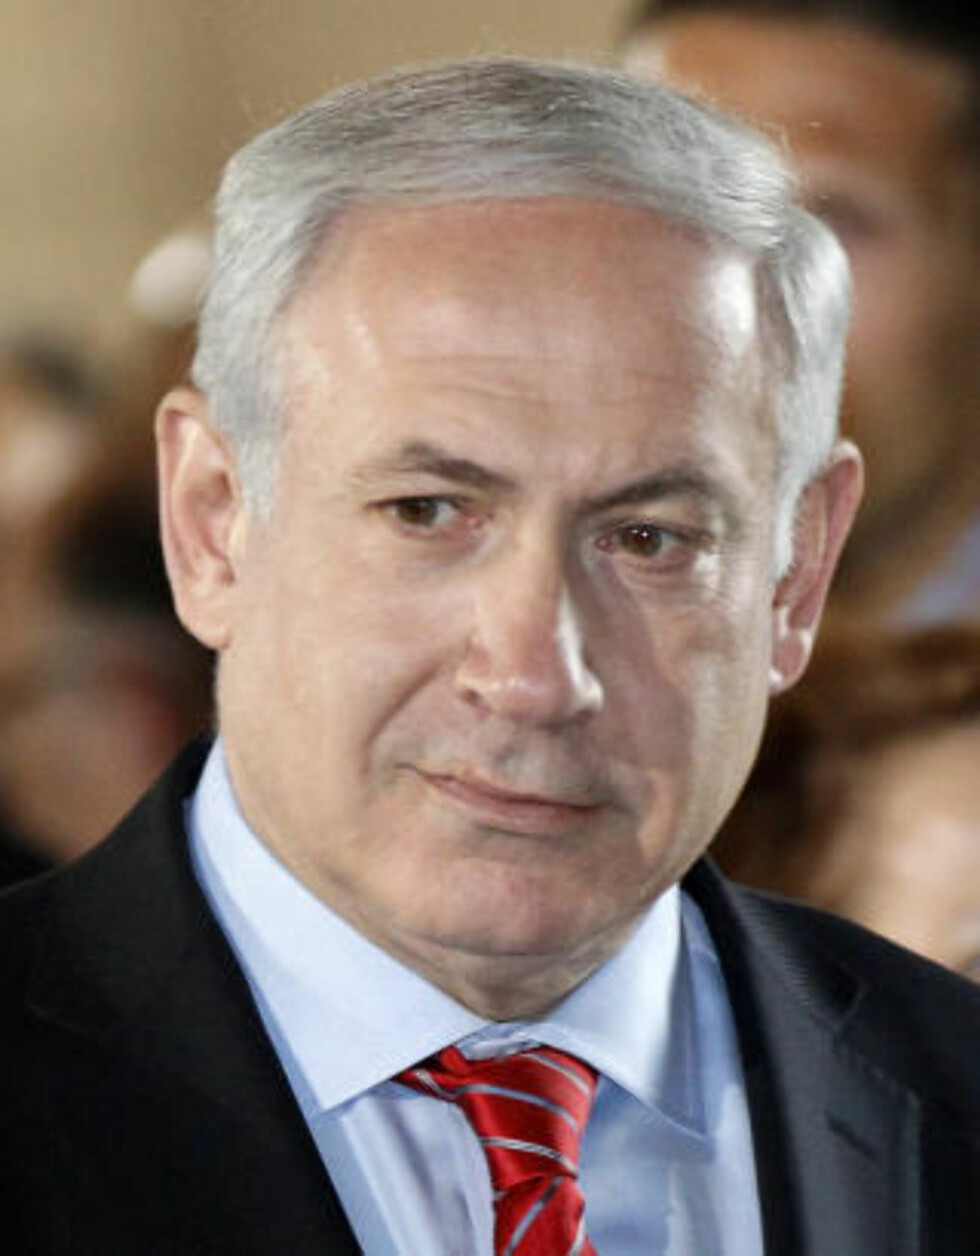 <strong>AVLYSER:</strong> Benjamin Netanyahu avlyser samtaler med Obama. Foto: REUTERS/Chris Wattie/SCANPIX